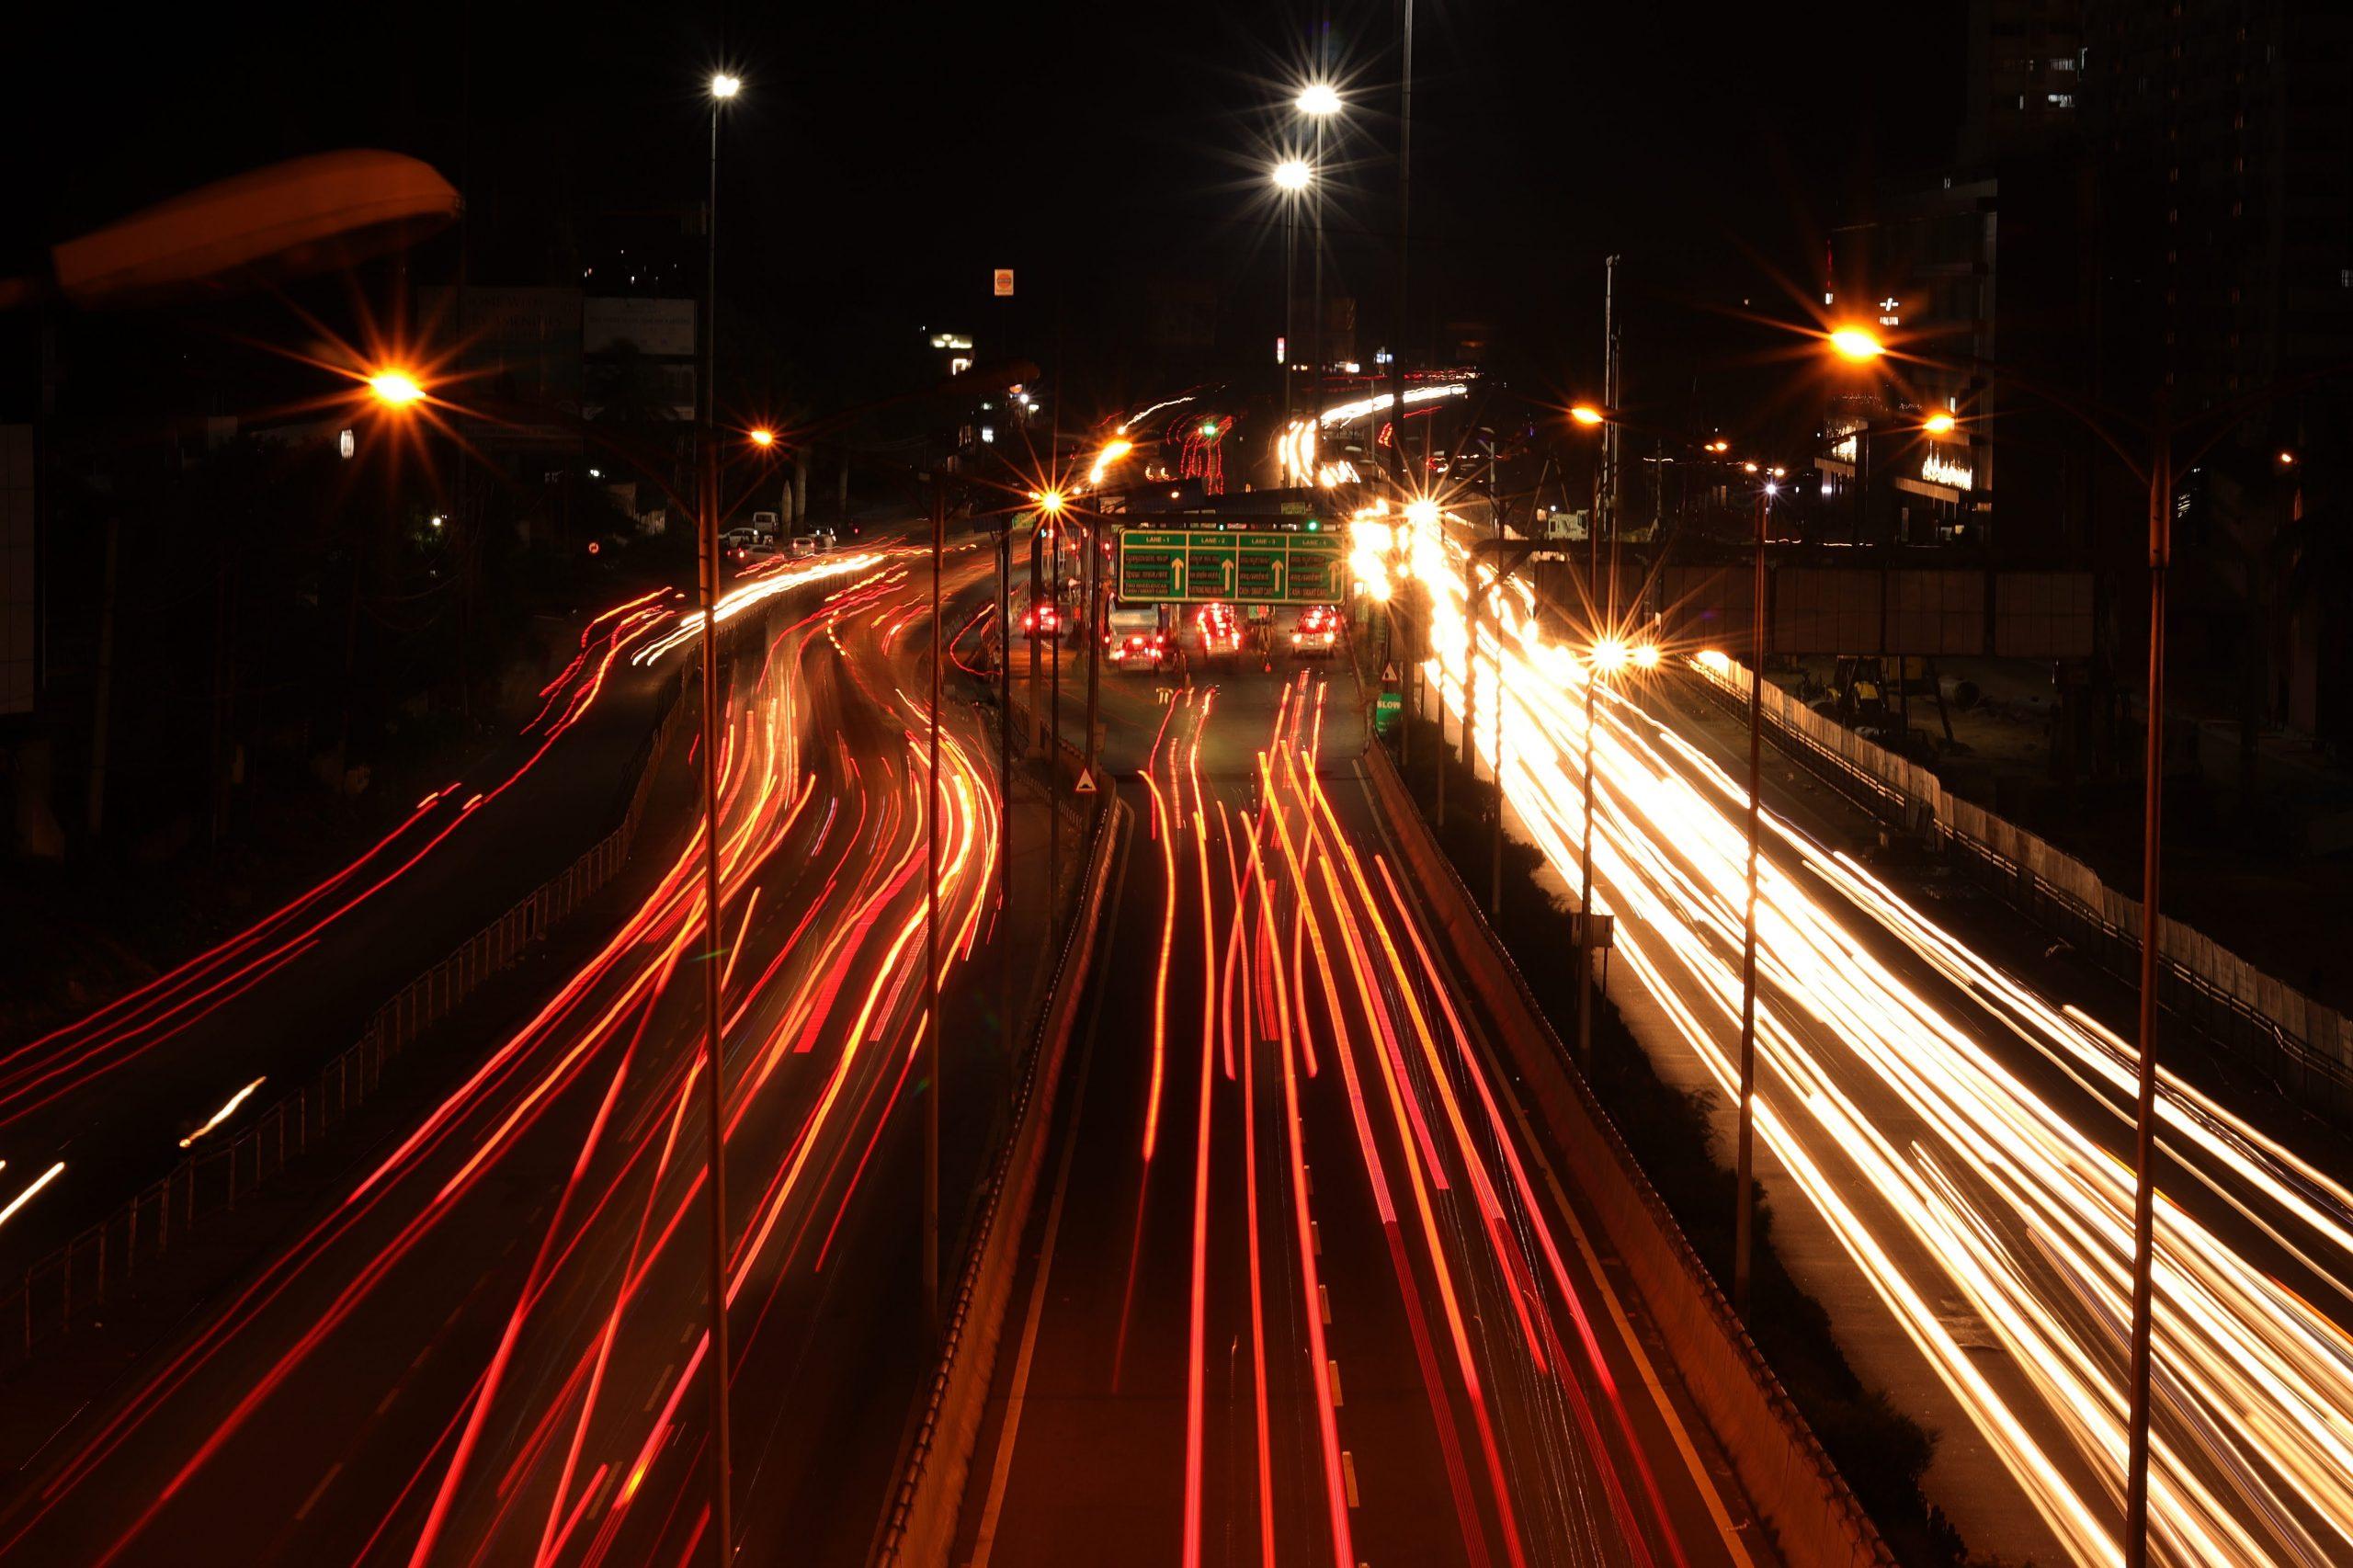 City at night- Bangalore.